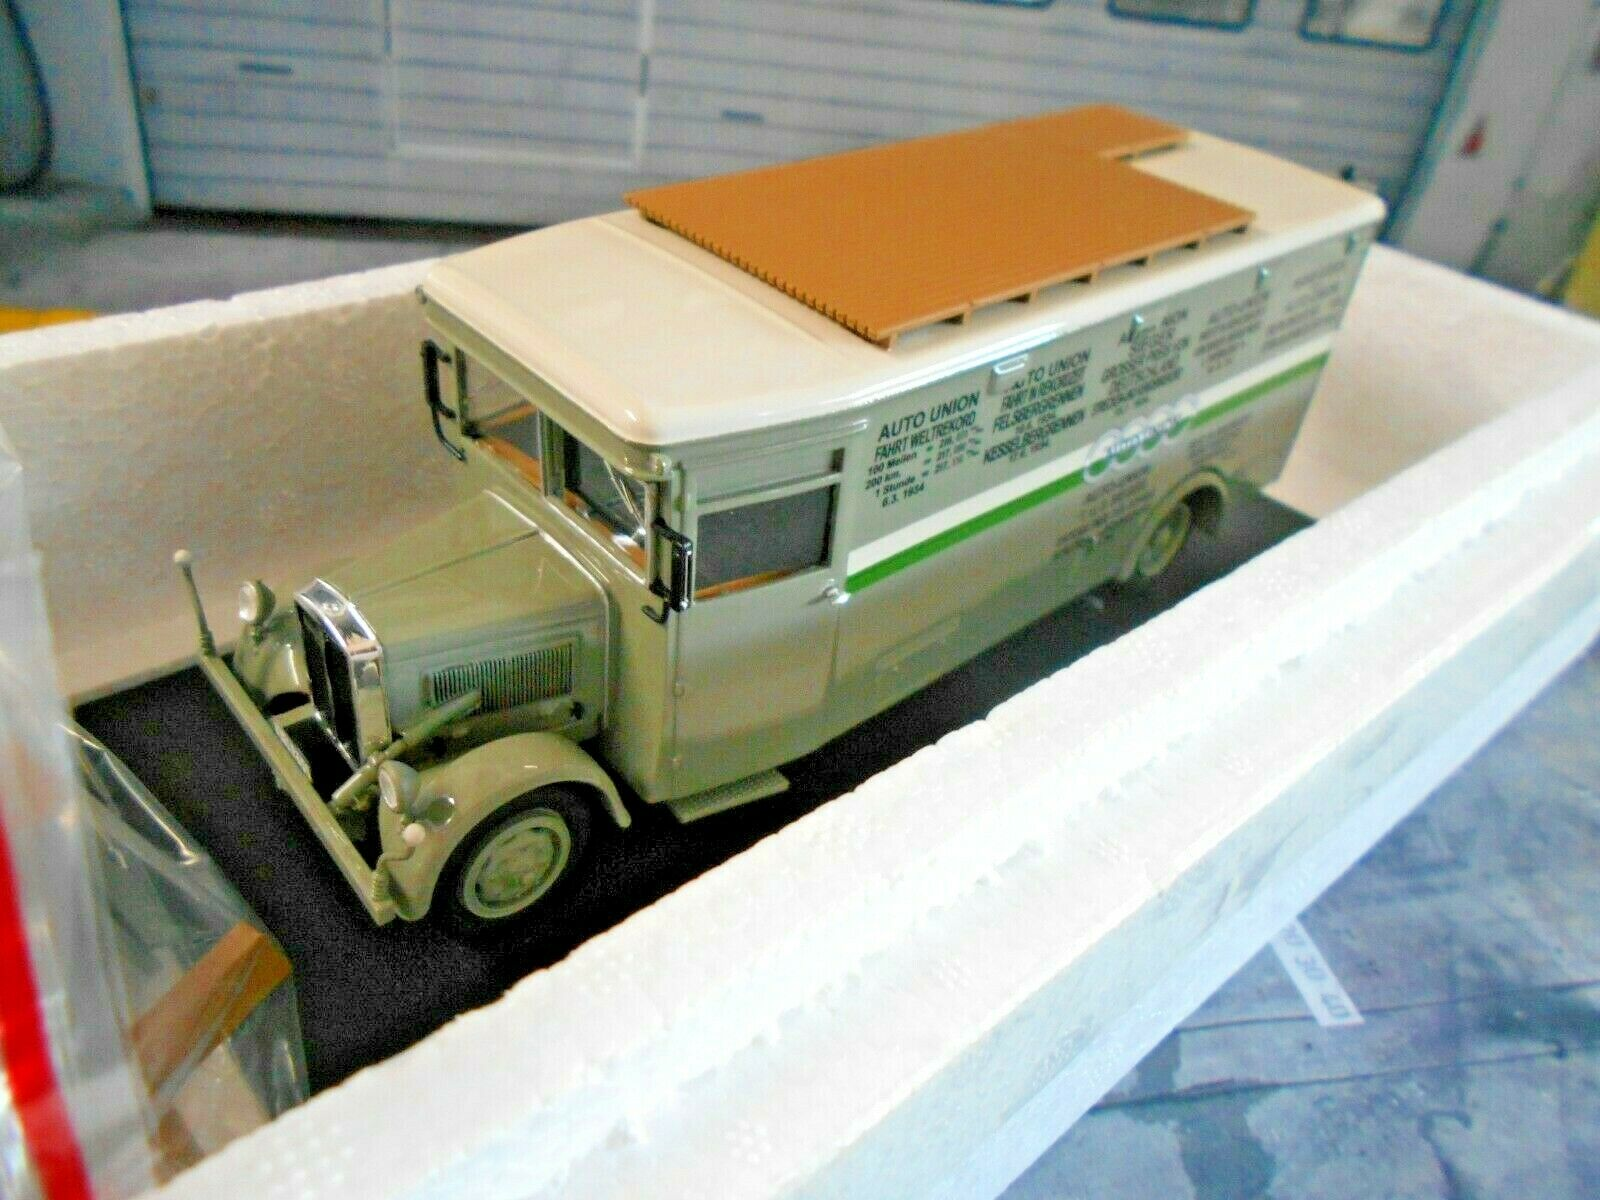 Nag Büssing renntransporter auto Unión Service audi camión camión neo 1 43